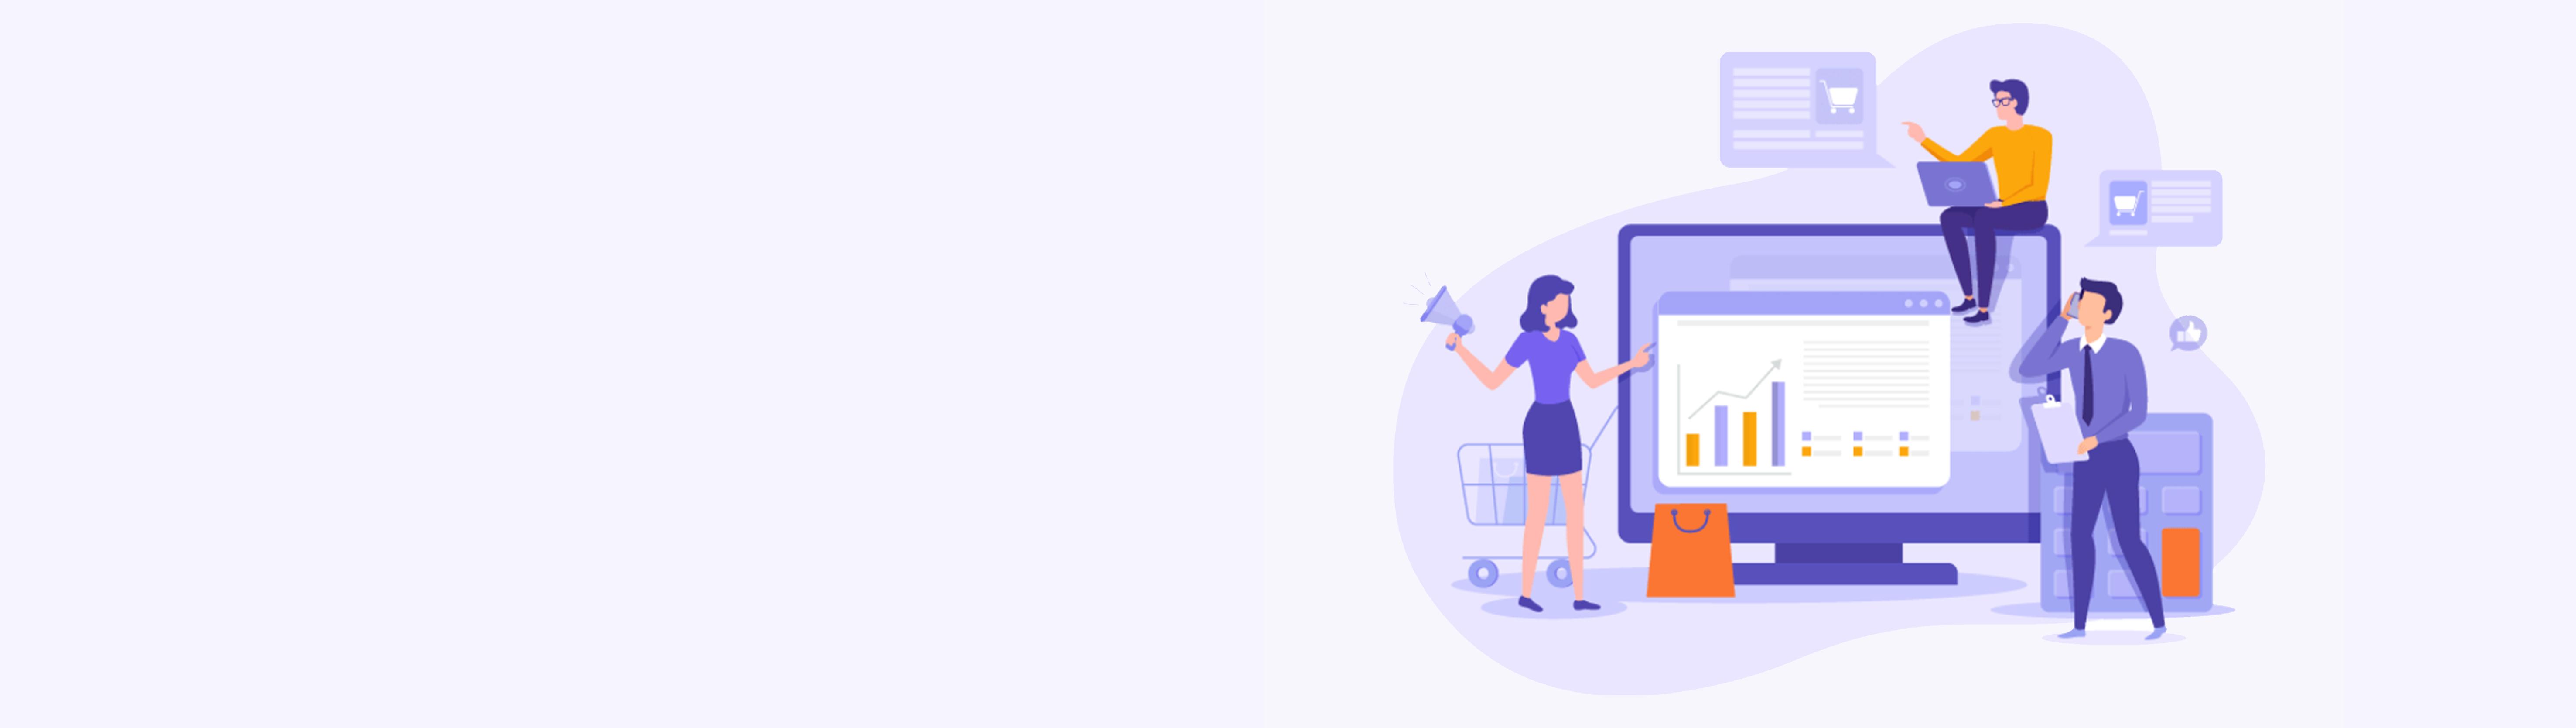 Smart Insight Portal